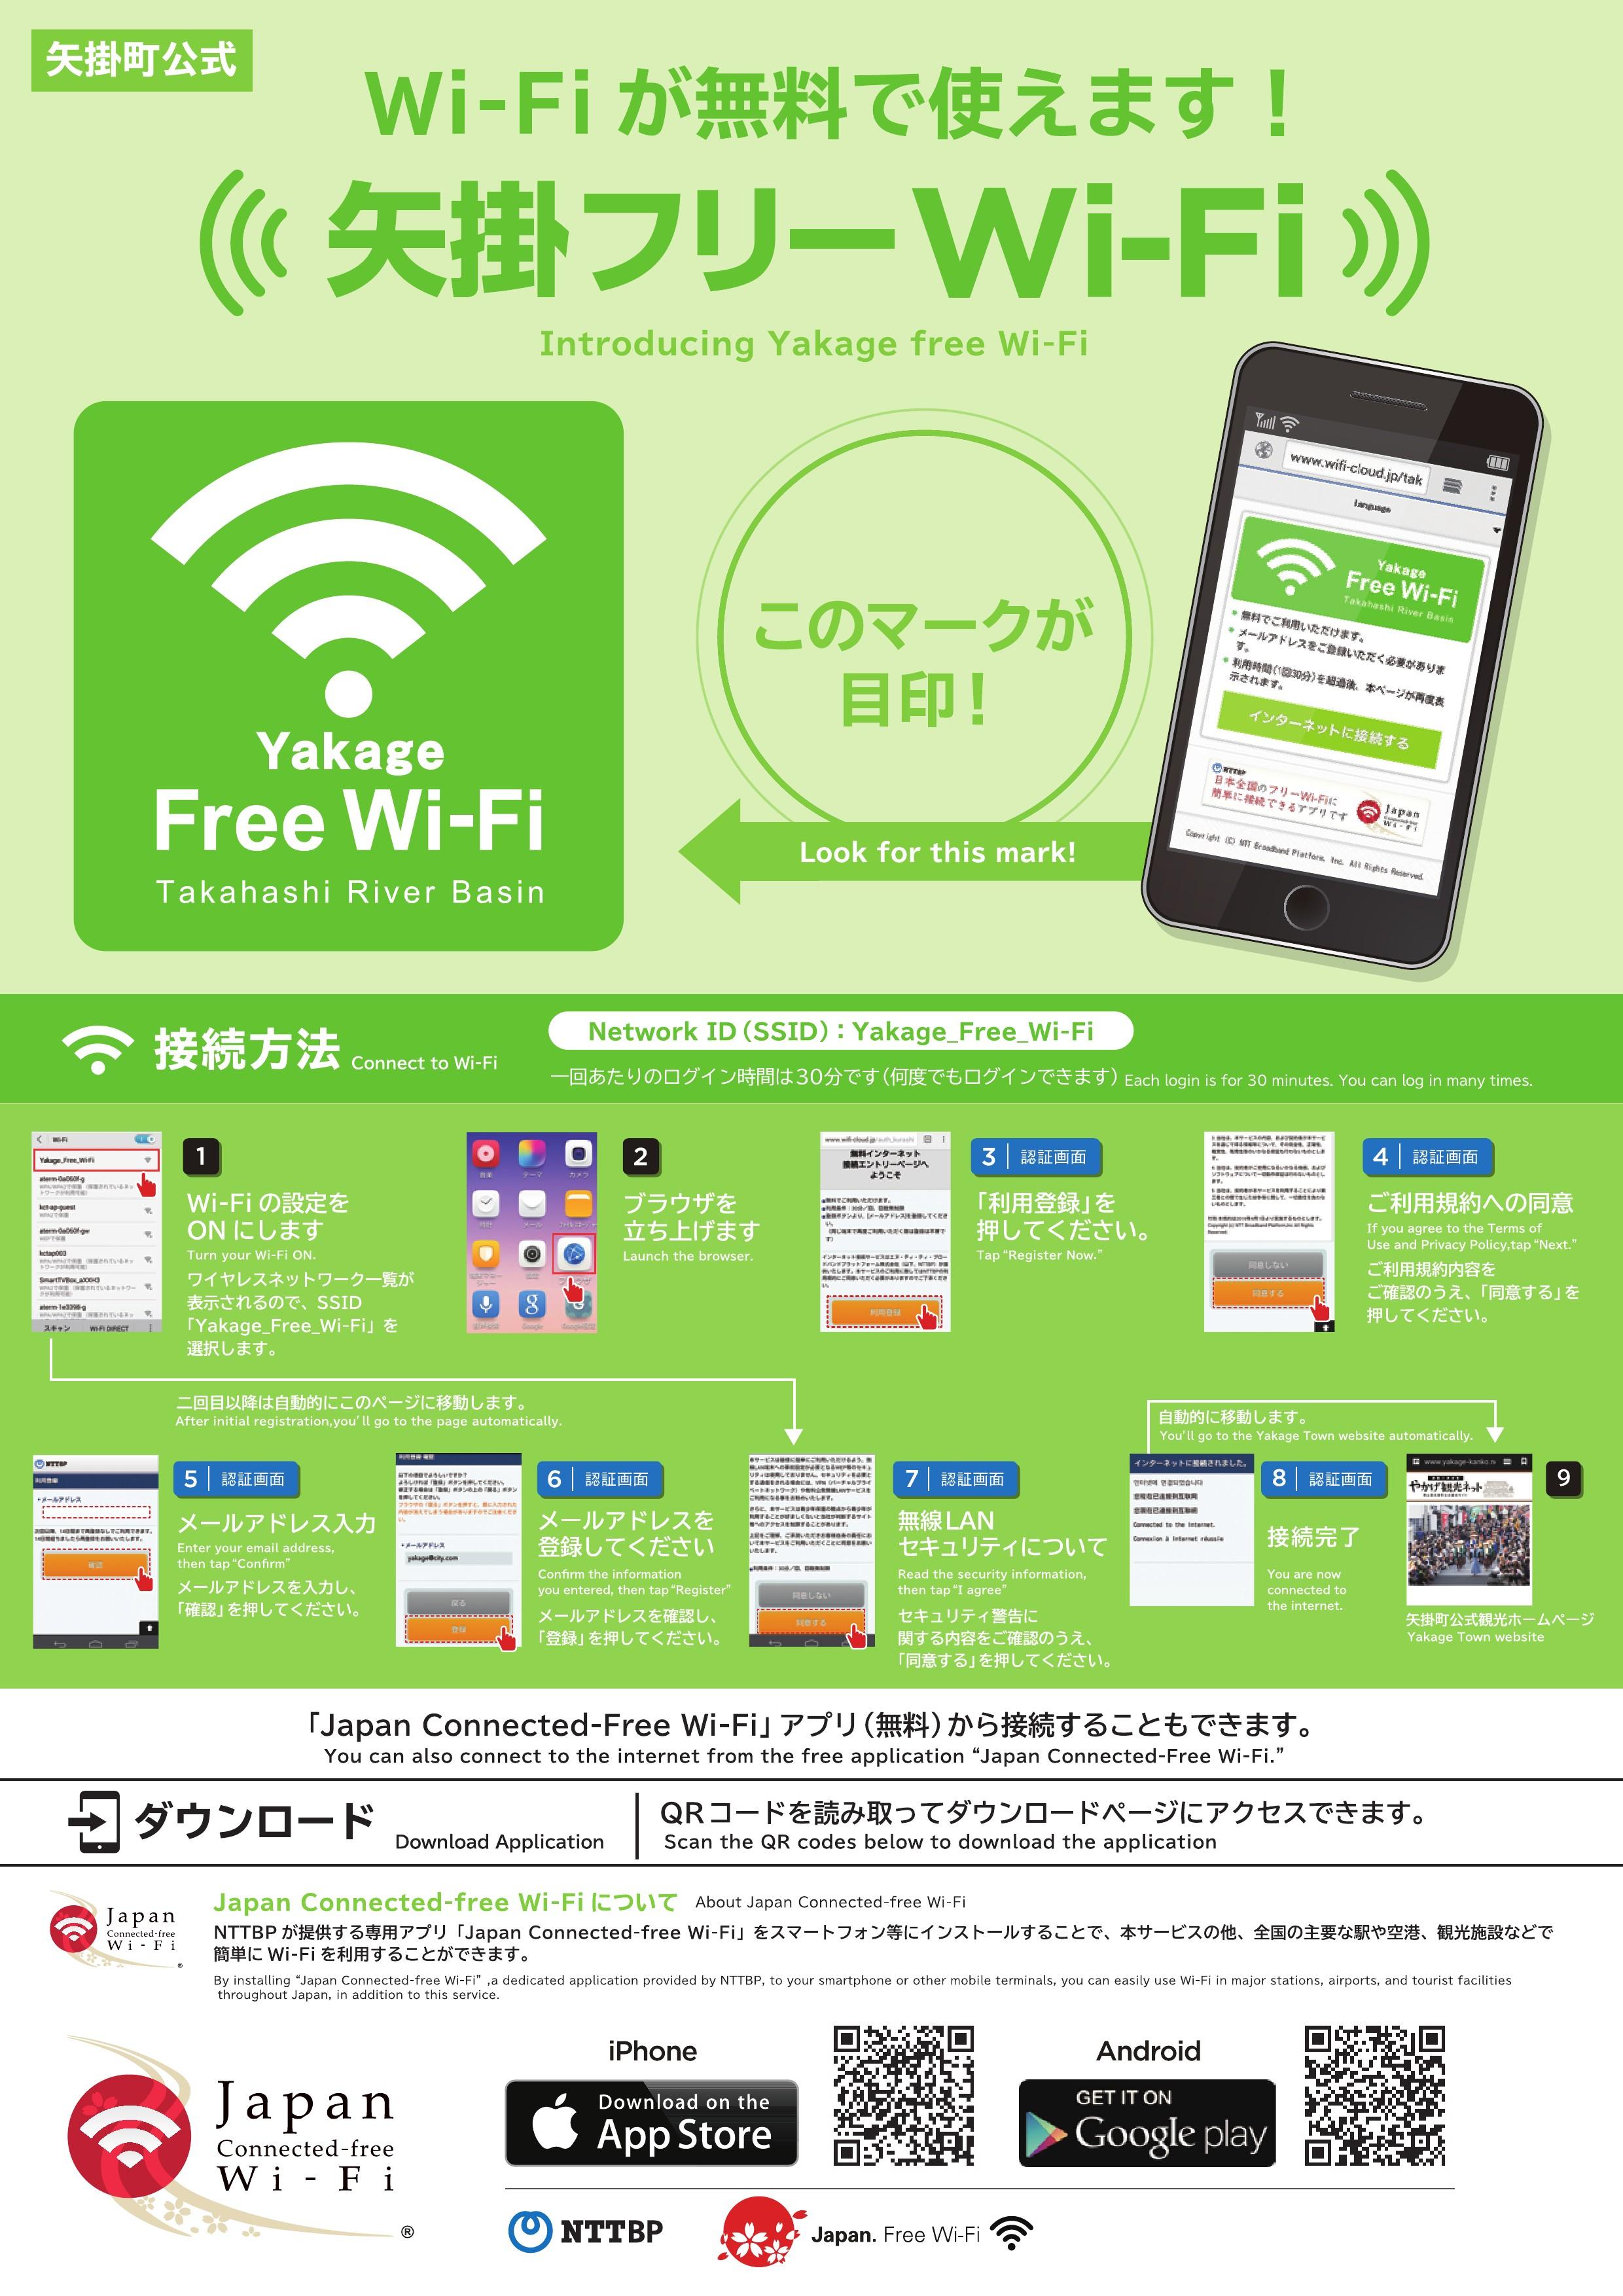 http://www.town.yakage.okayama.jp/img/wifi01.jpg